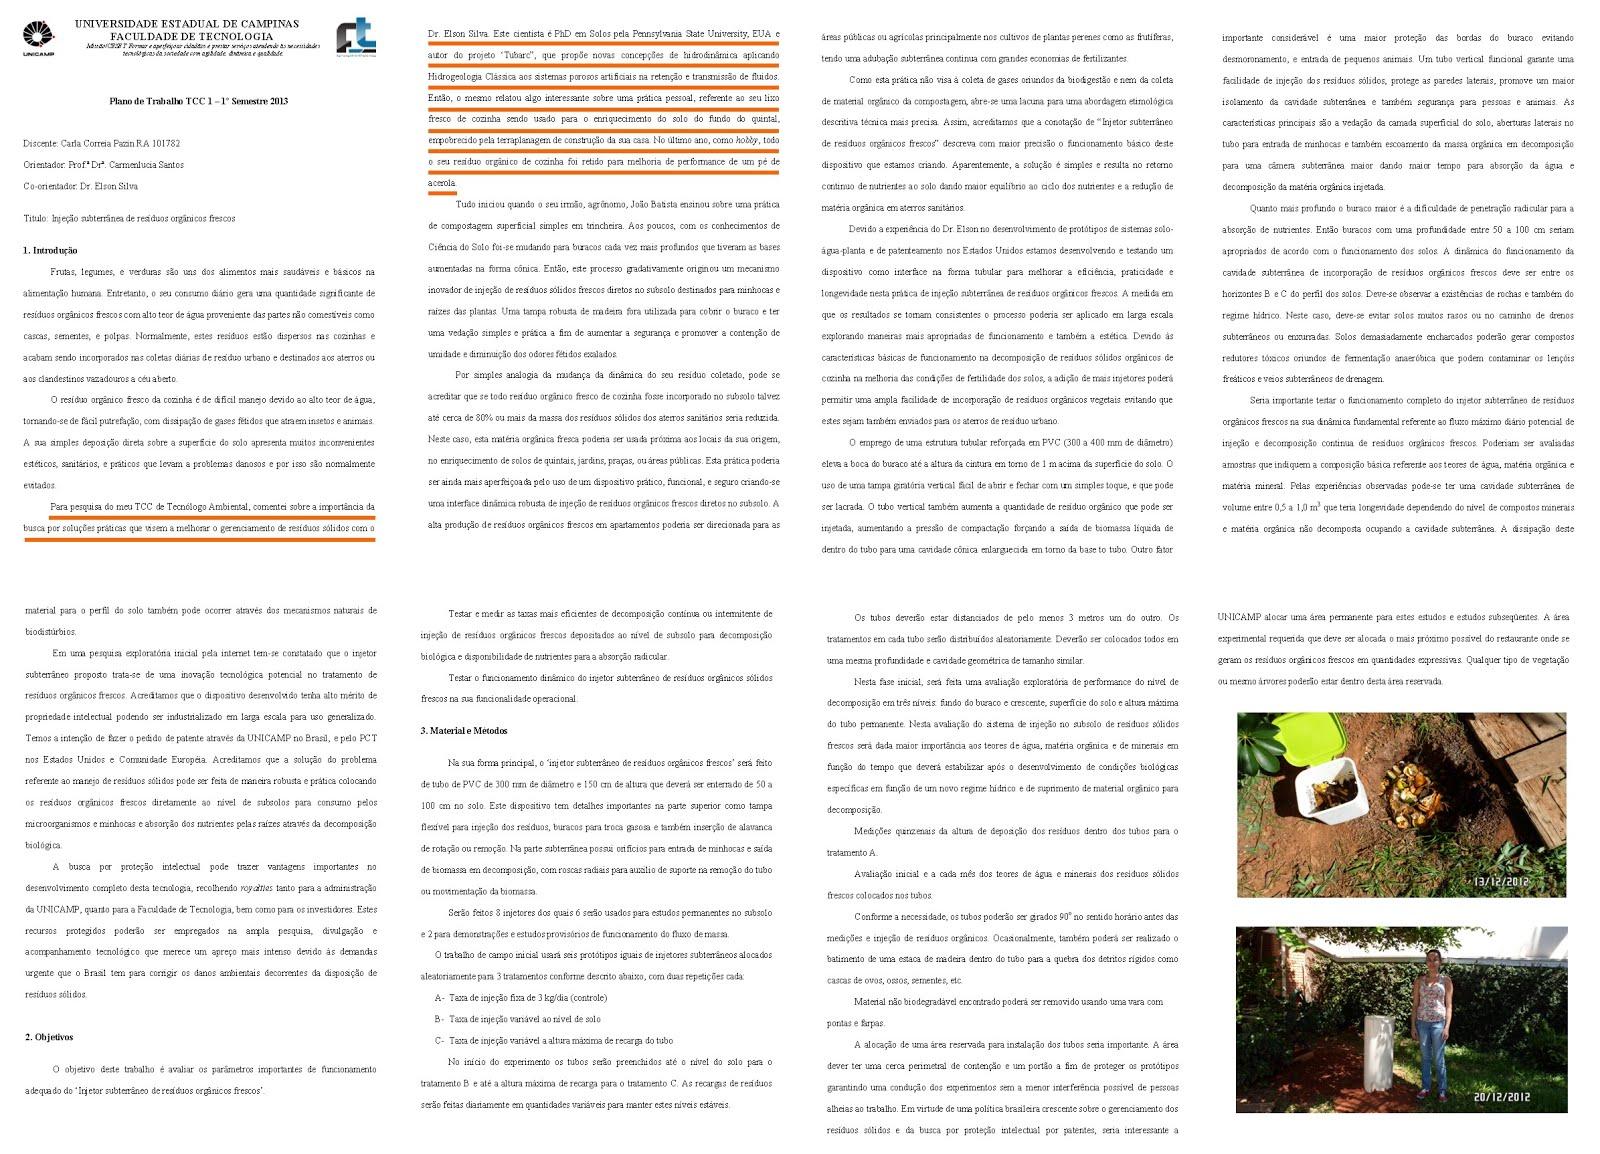 Fuji electric ongoing massive patent violations injetor de e mails mostrando a evoluo da discusso do projeto da carla pazin na busca de inovao tecnolgica fandeluxe Image collections